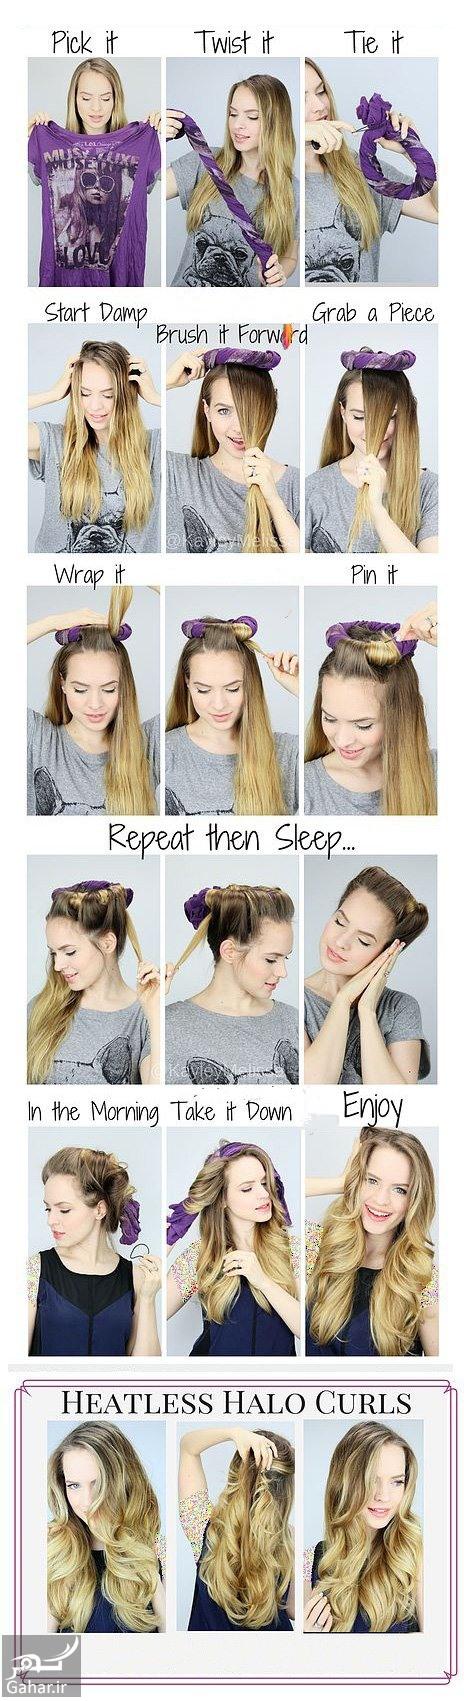 haire style آموزش گام به گام فر کردن مو به روش خانگی